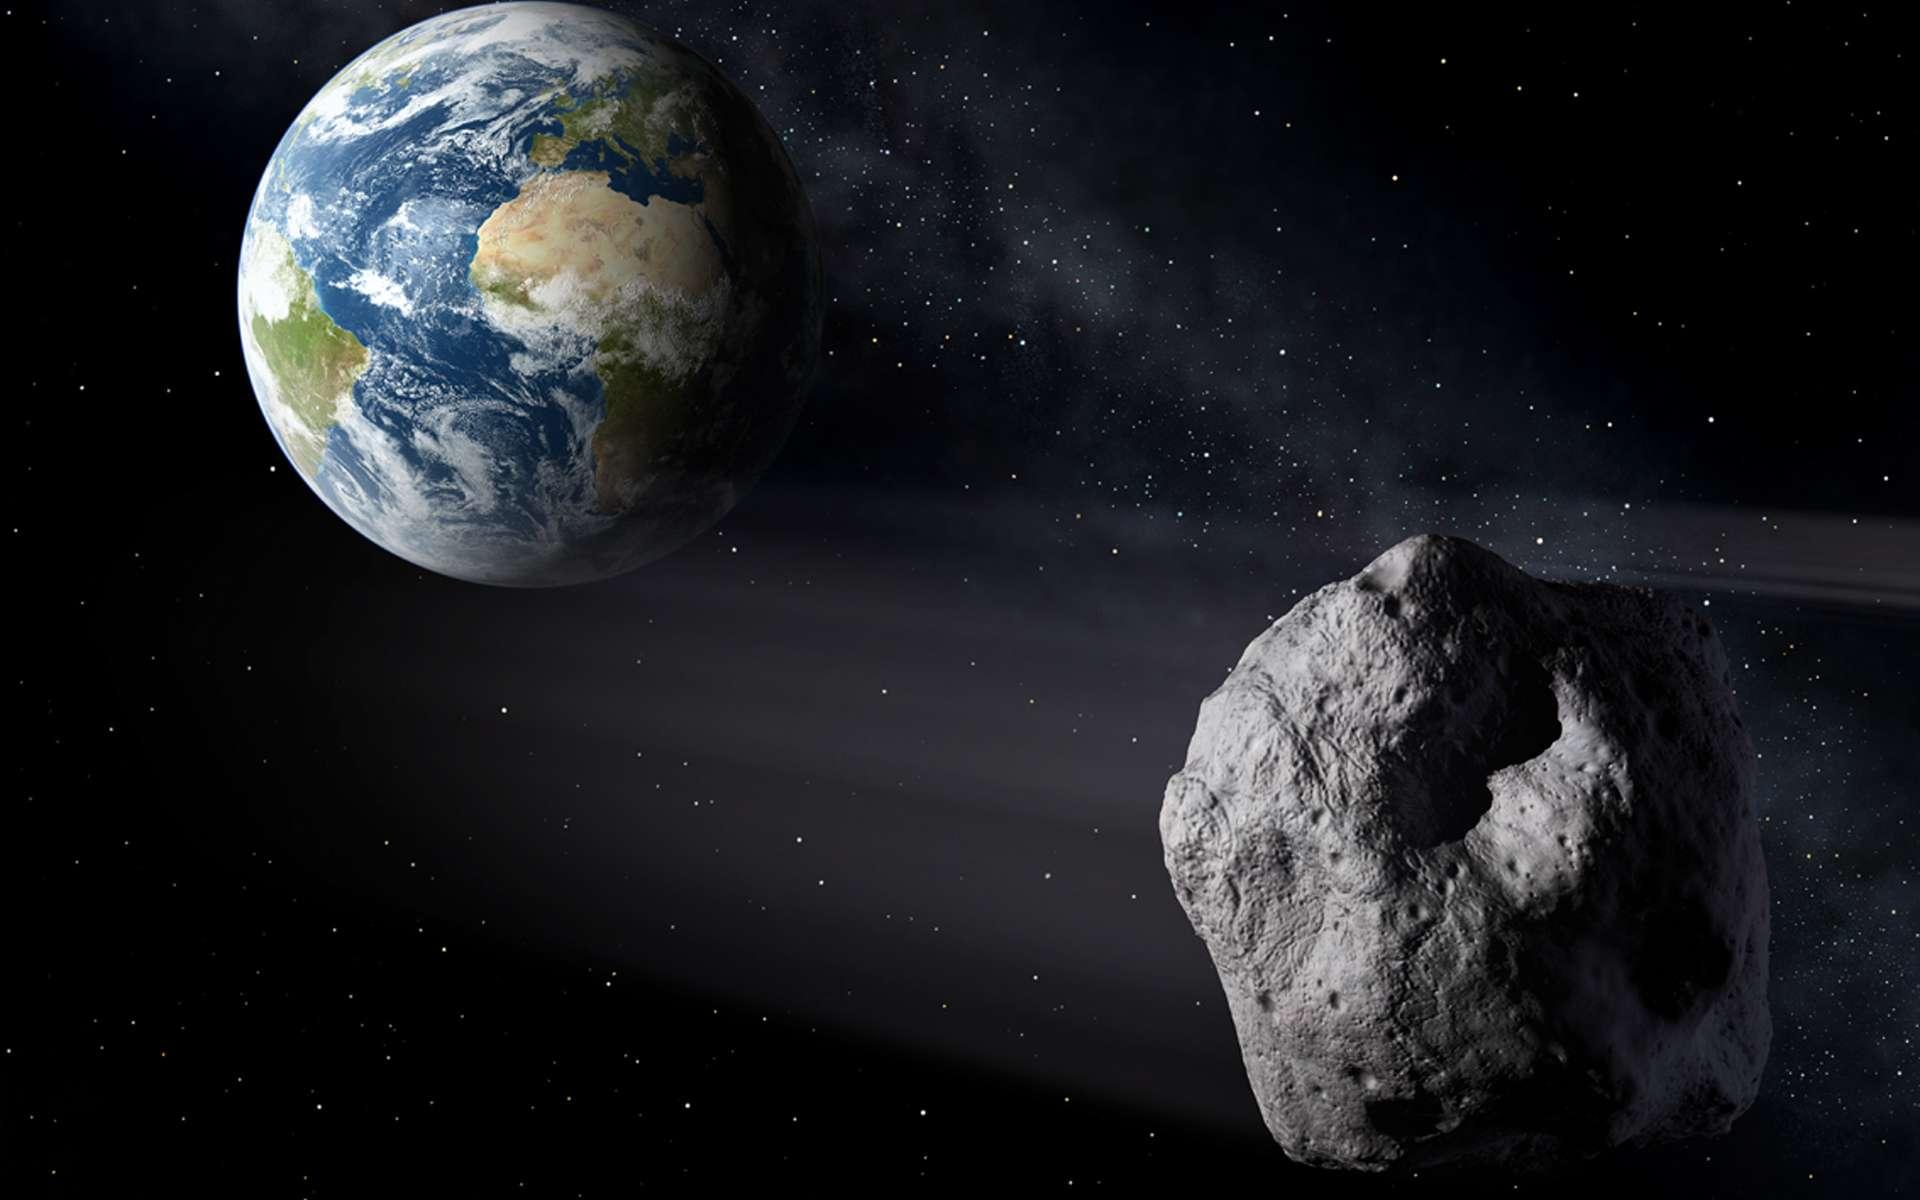 2c8e5fa134 101172 asteroide terre